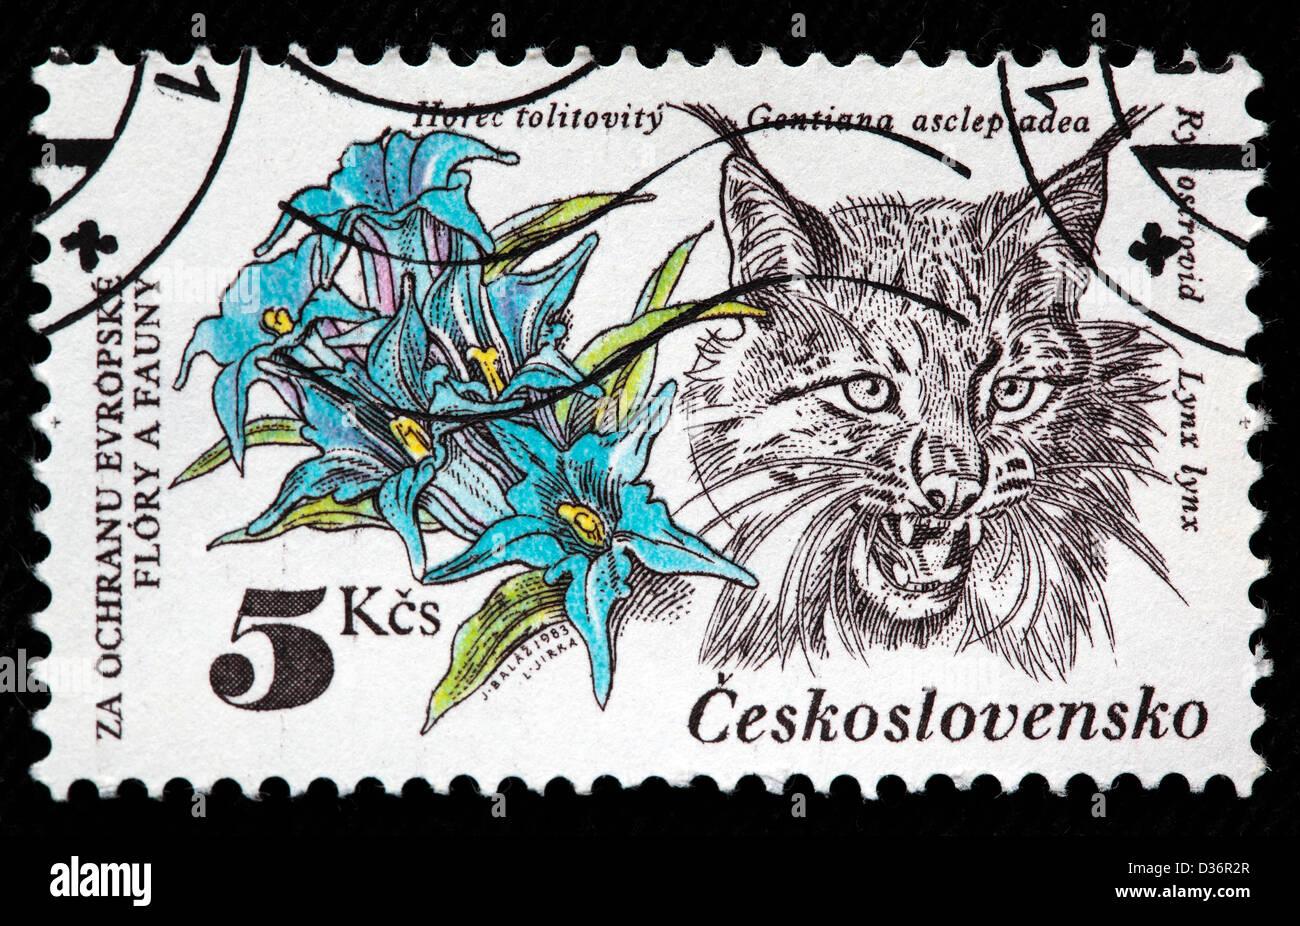 Gentians, lynx, postage stamp, Czechoslovakia, 1983 - Stock Image